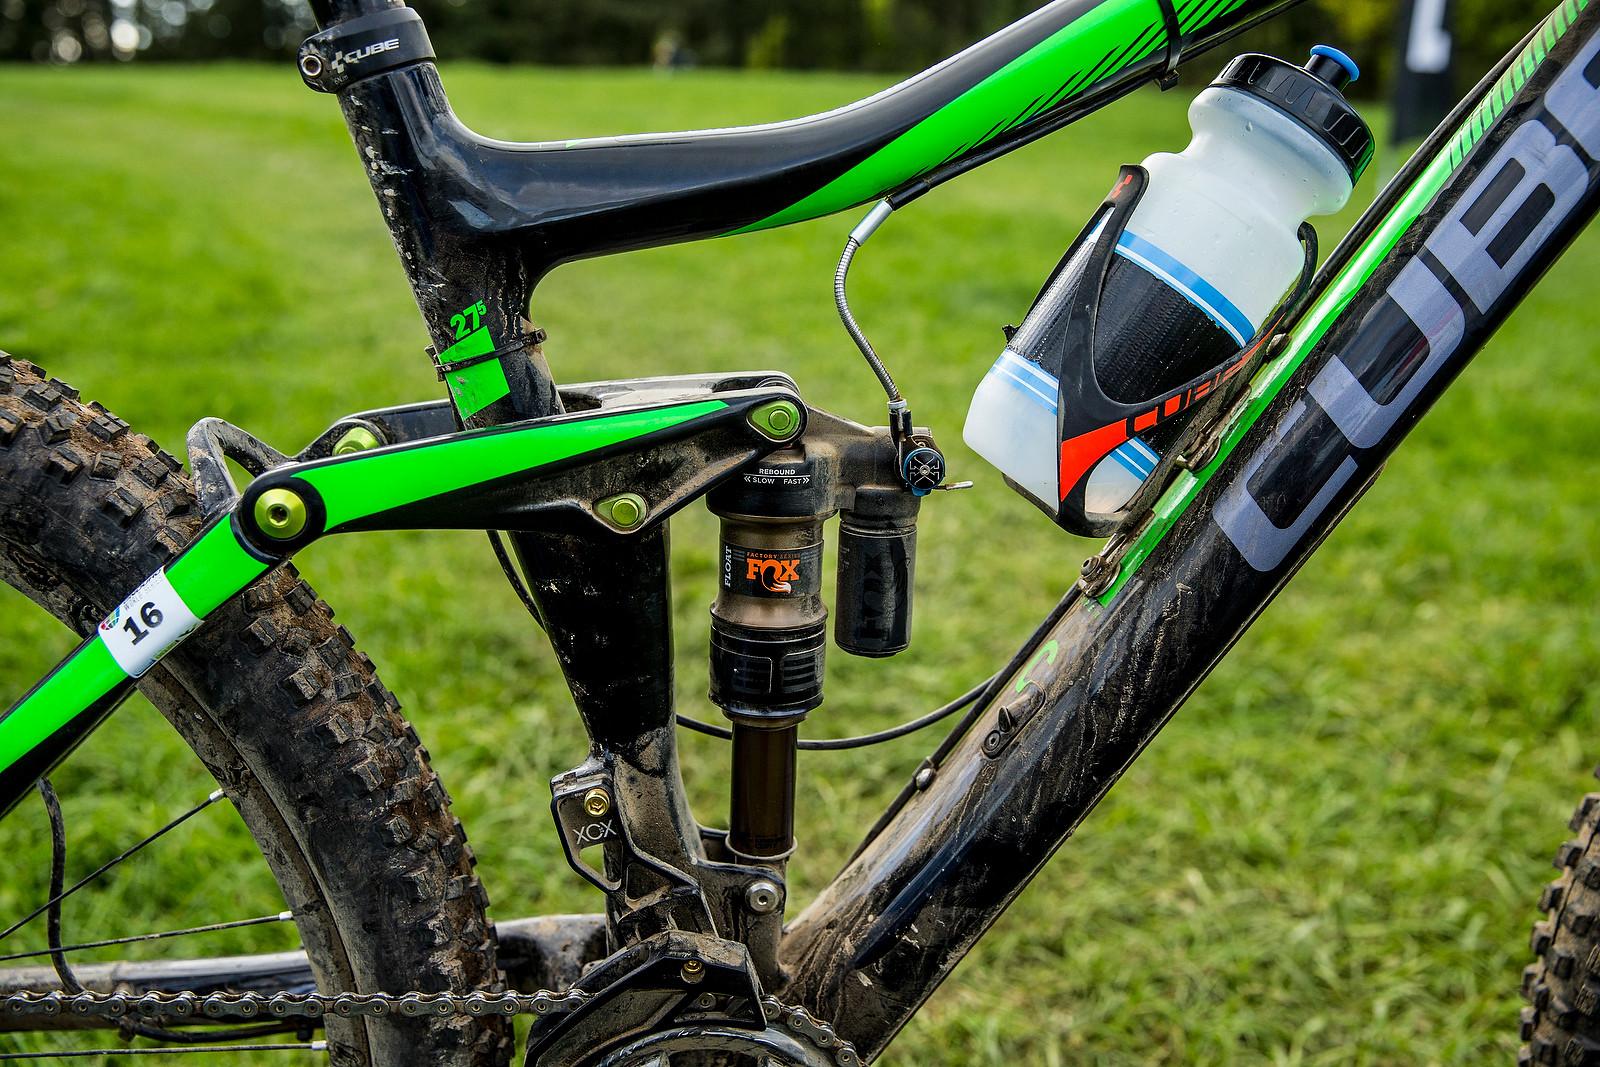 Greg Callaghan's Cube Stereo 140 Super HPC SL 27.5 - WINNING BIKE: Greg Callaghan's Cube Stereo 140 Super HPC SL 27.5 - Mountain Biking Pictures - Vital MTB